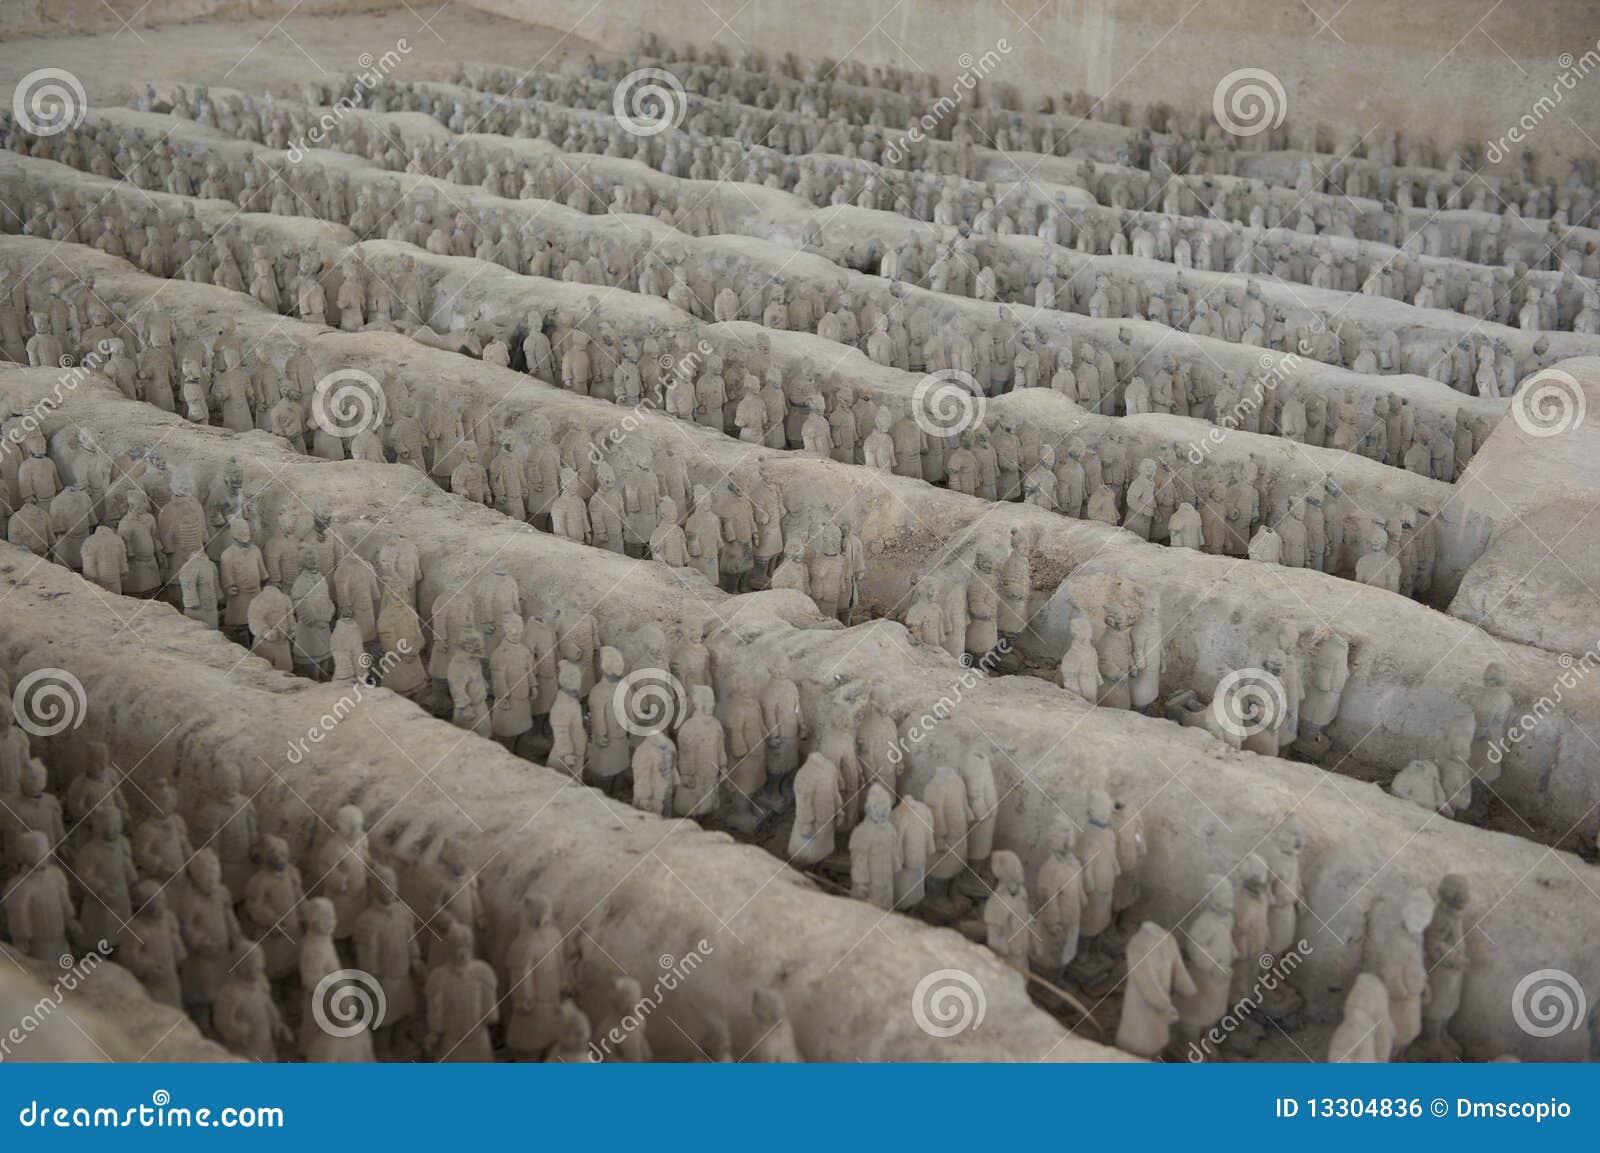 History China miniature terracotta army clay Shenz